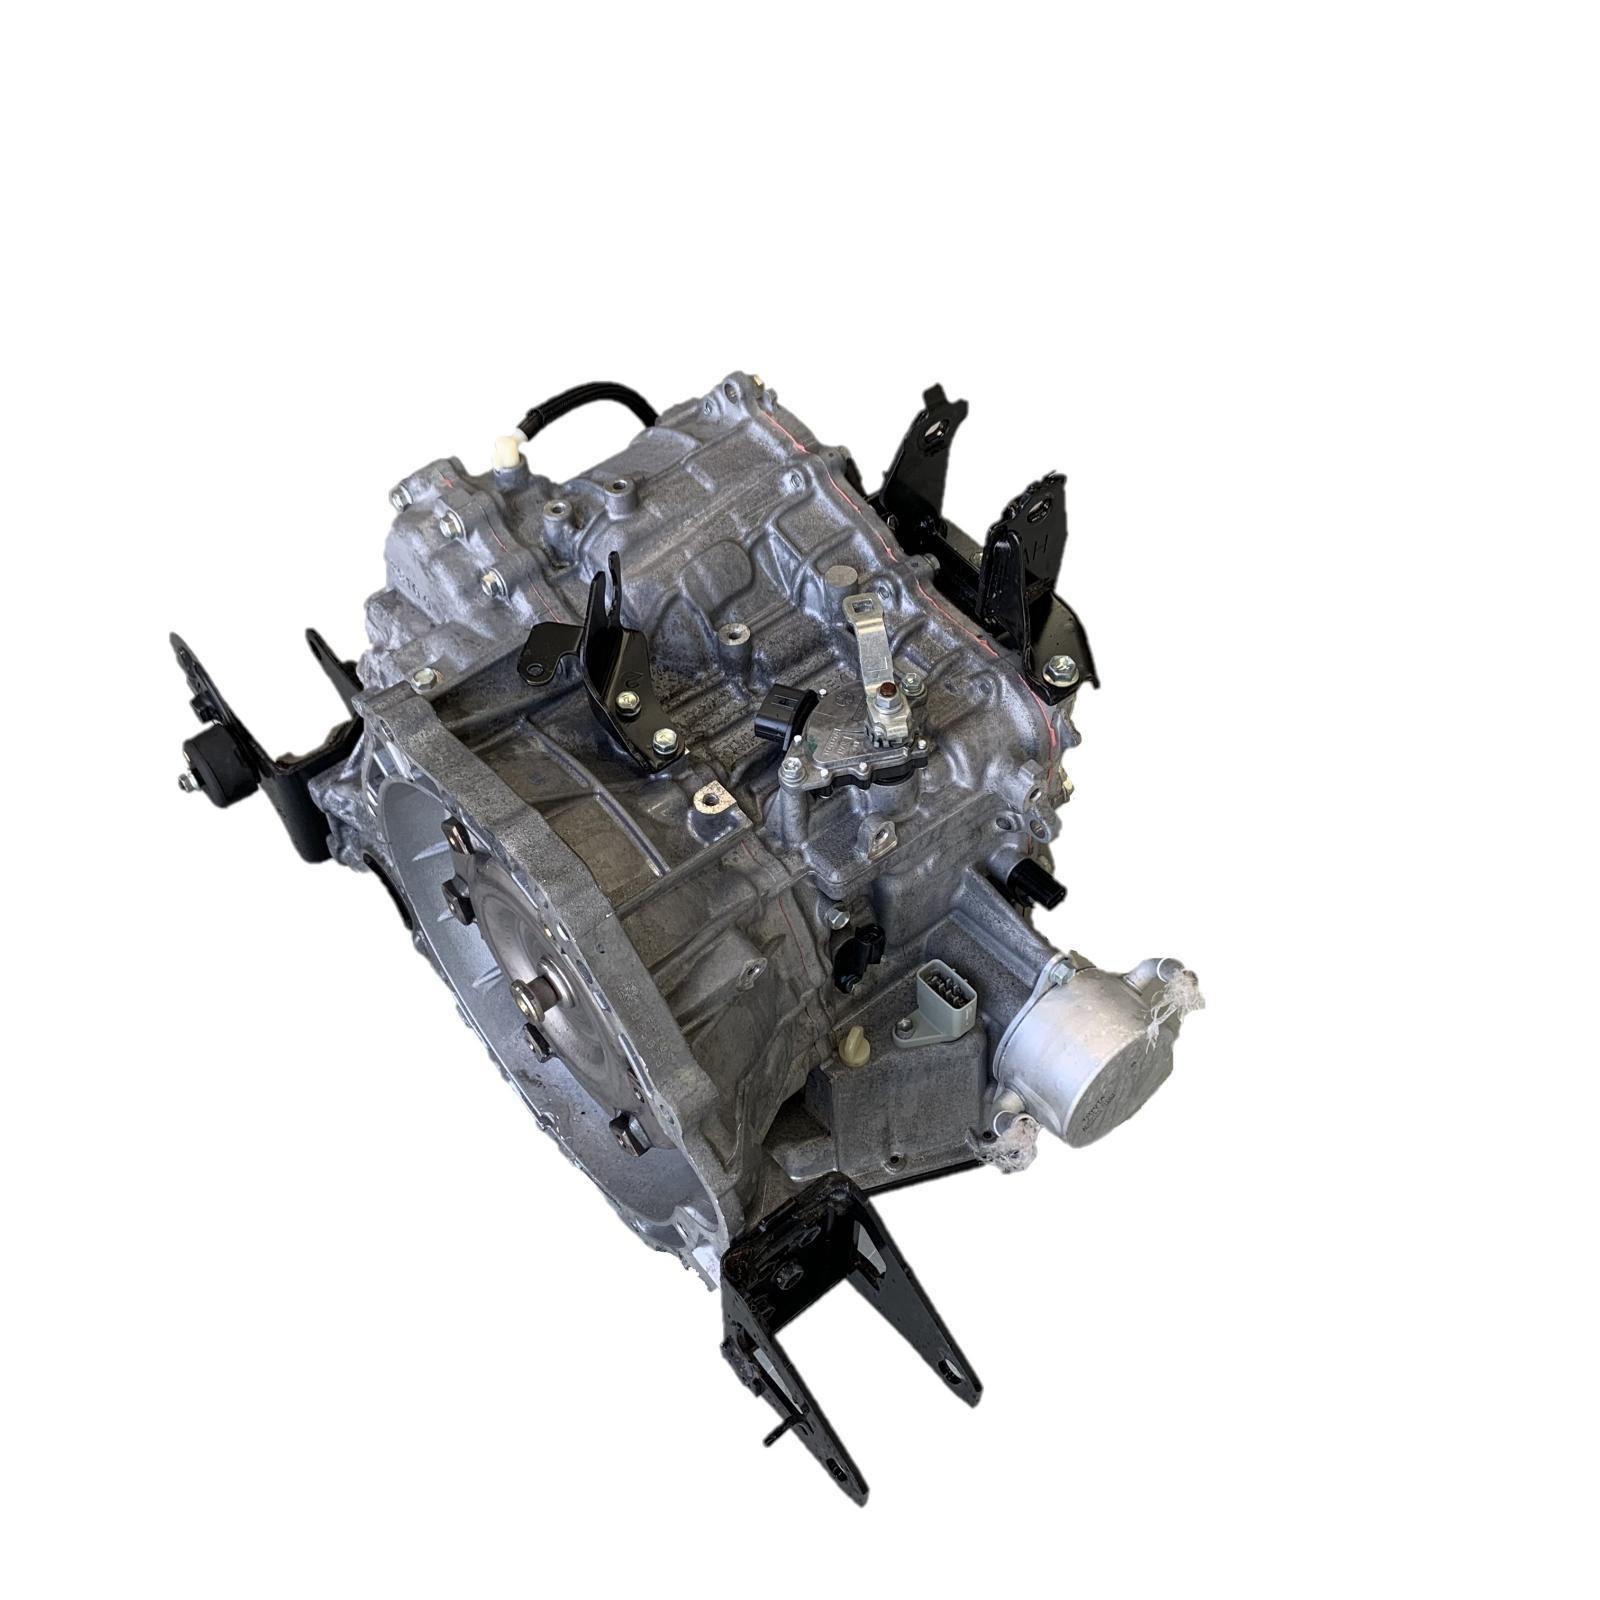 TOYOTA COROLLA, Trans/Gearbox, AUTO, PETROL, 1.8, 2ZR-FE, K313 CODE, ZRE172R (VIN MR0), SEDAN, 12/13-